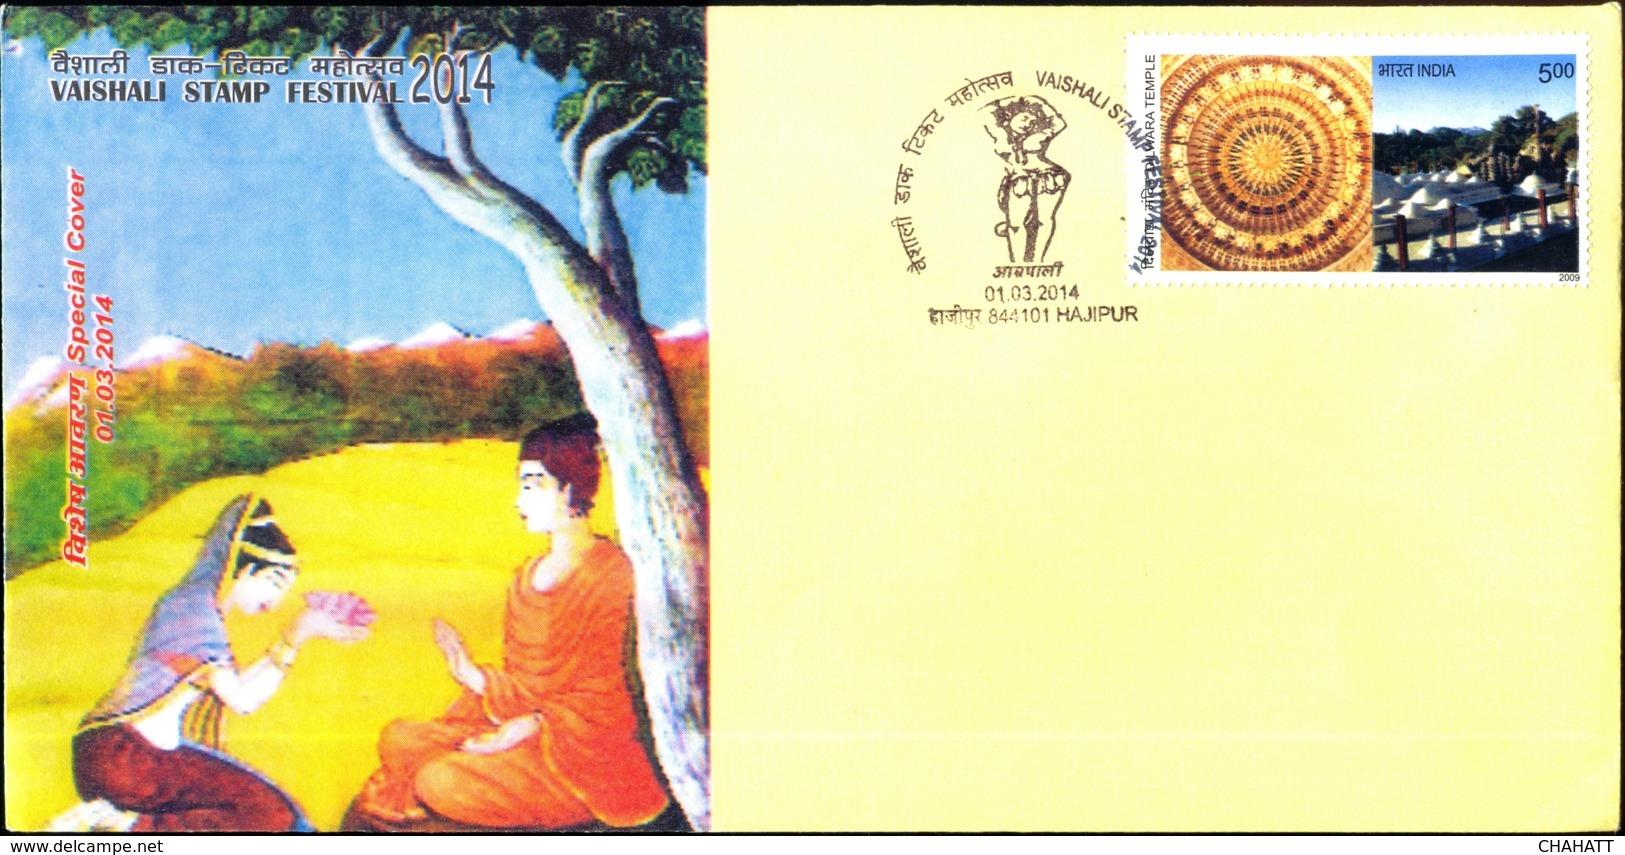 BUDDHISM-BUDDHA & AMRAPALI- DISCOURSES AT VAISHALI-SPECIAL COVER-INDIA-2014-BX1-393 - Budismo